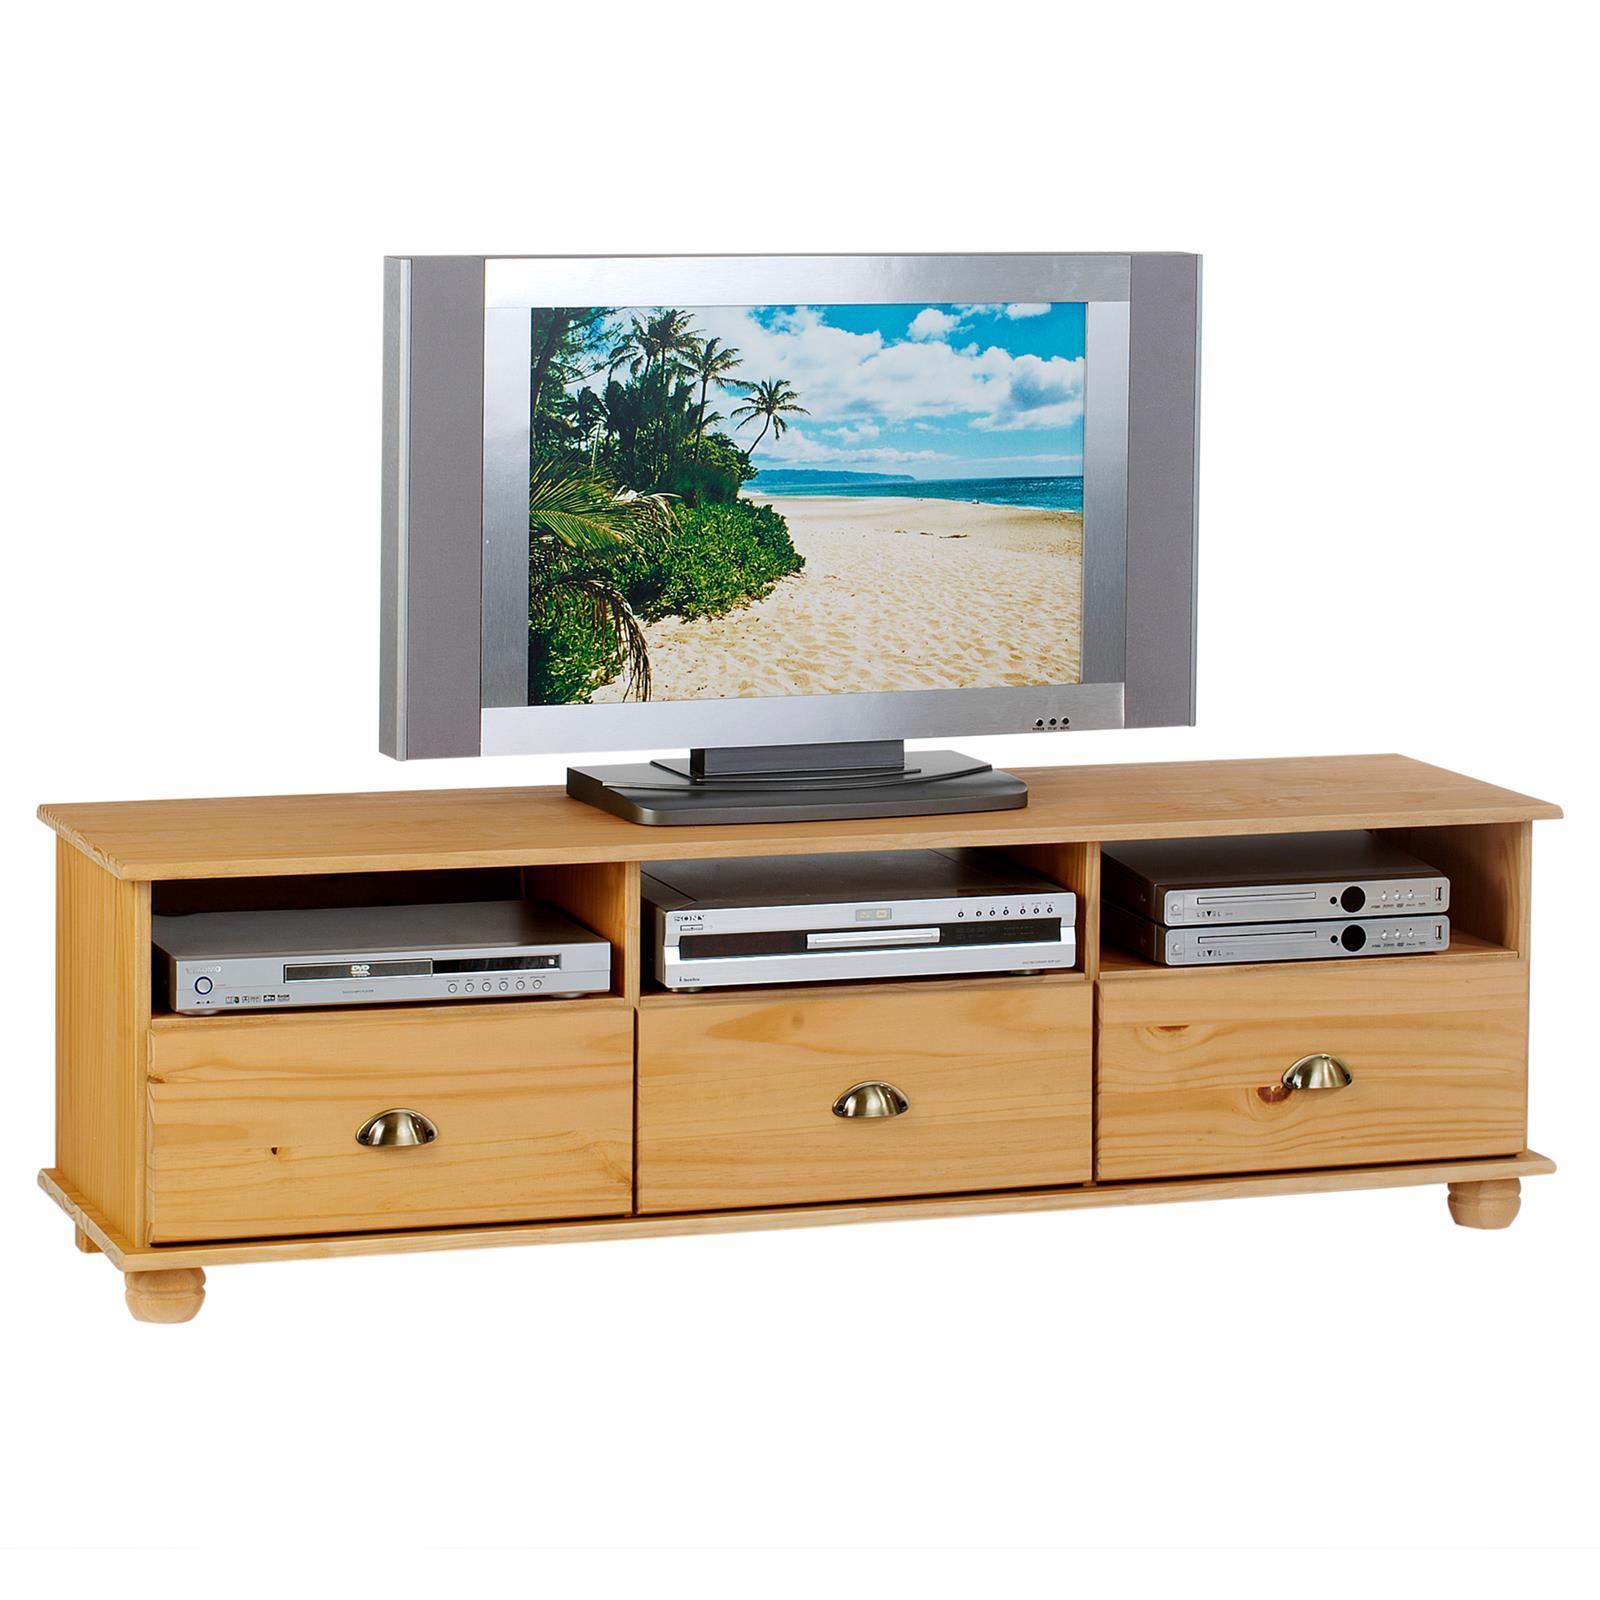 meuble tv en pin colmar 3 tiroirs 3 niches finition cir e mobil meubles. Black Bedroom Furniture Sets. Home Design Ideas